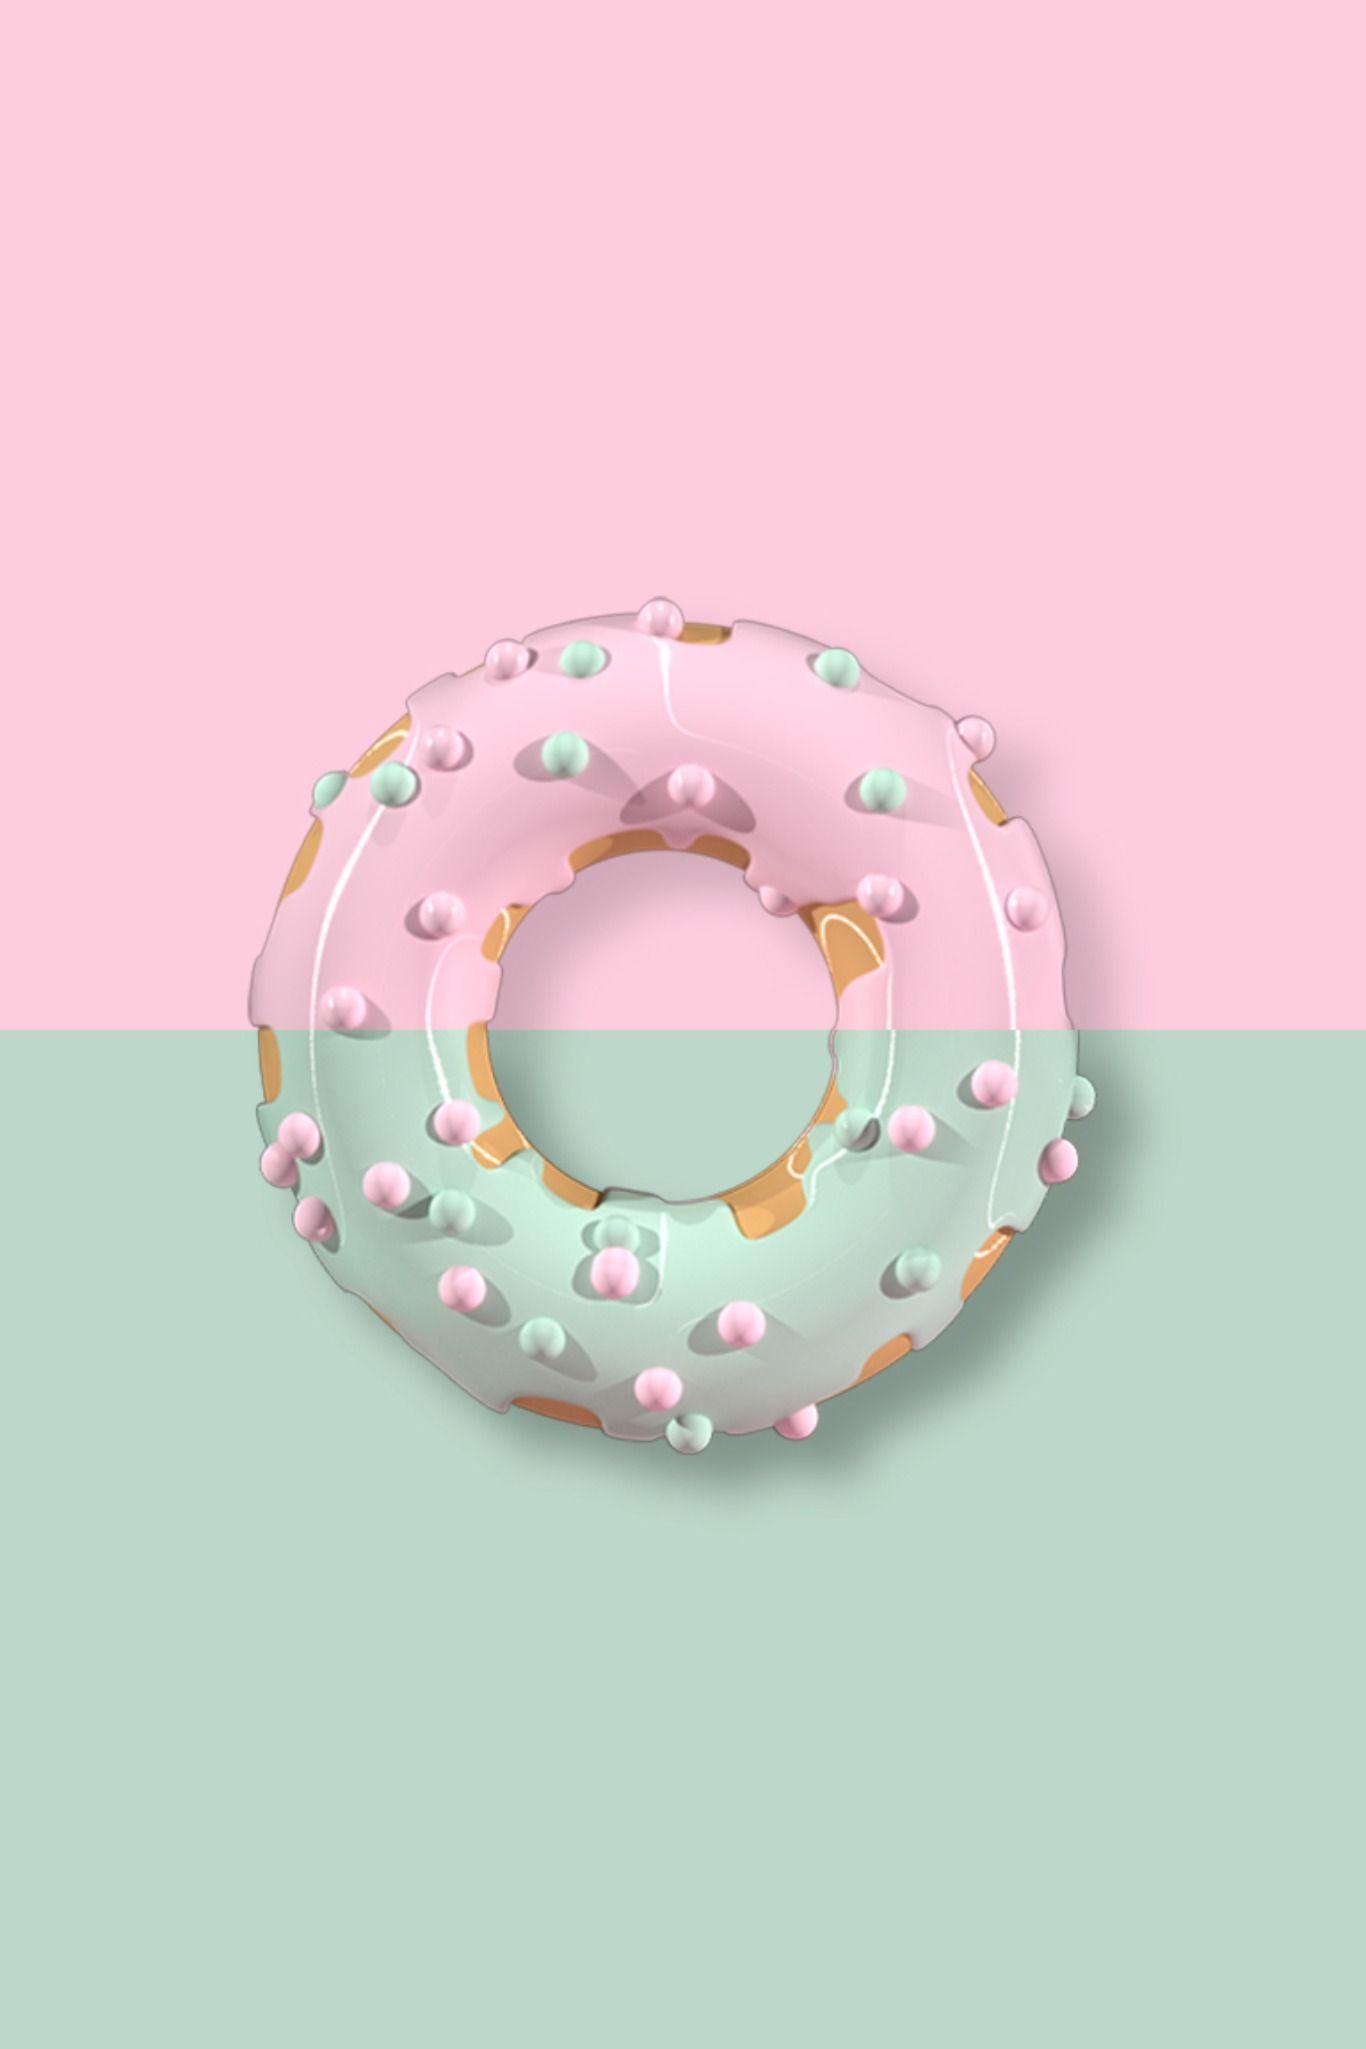 Donut Pink Wallpaper Iphone Wallpaper Iphone Cute Flower Phone Wallpaper